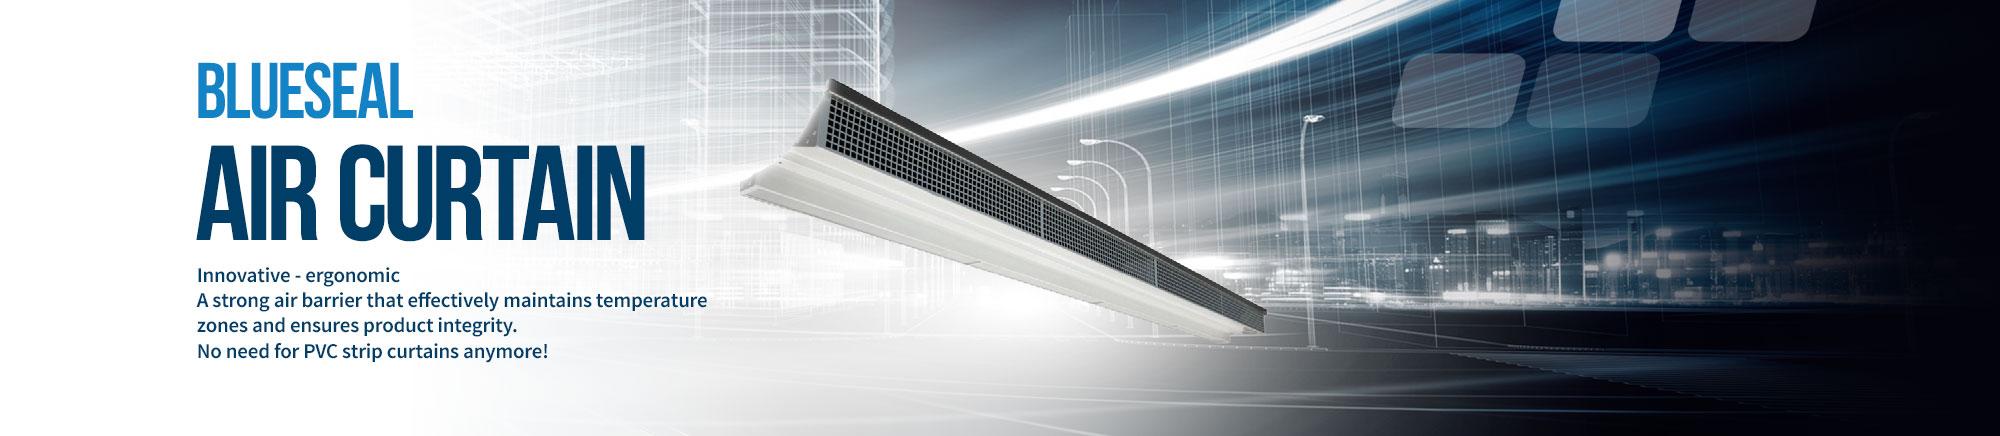 Air Curtain Innovation And Ergonomics